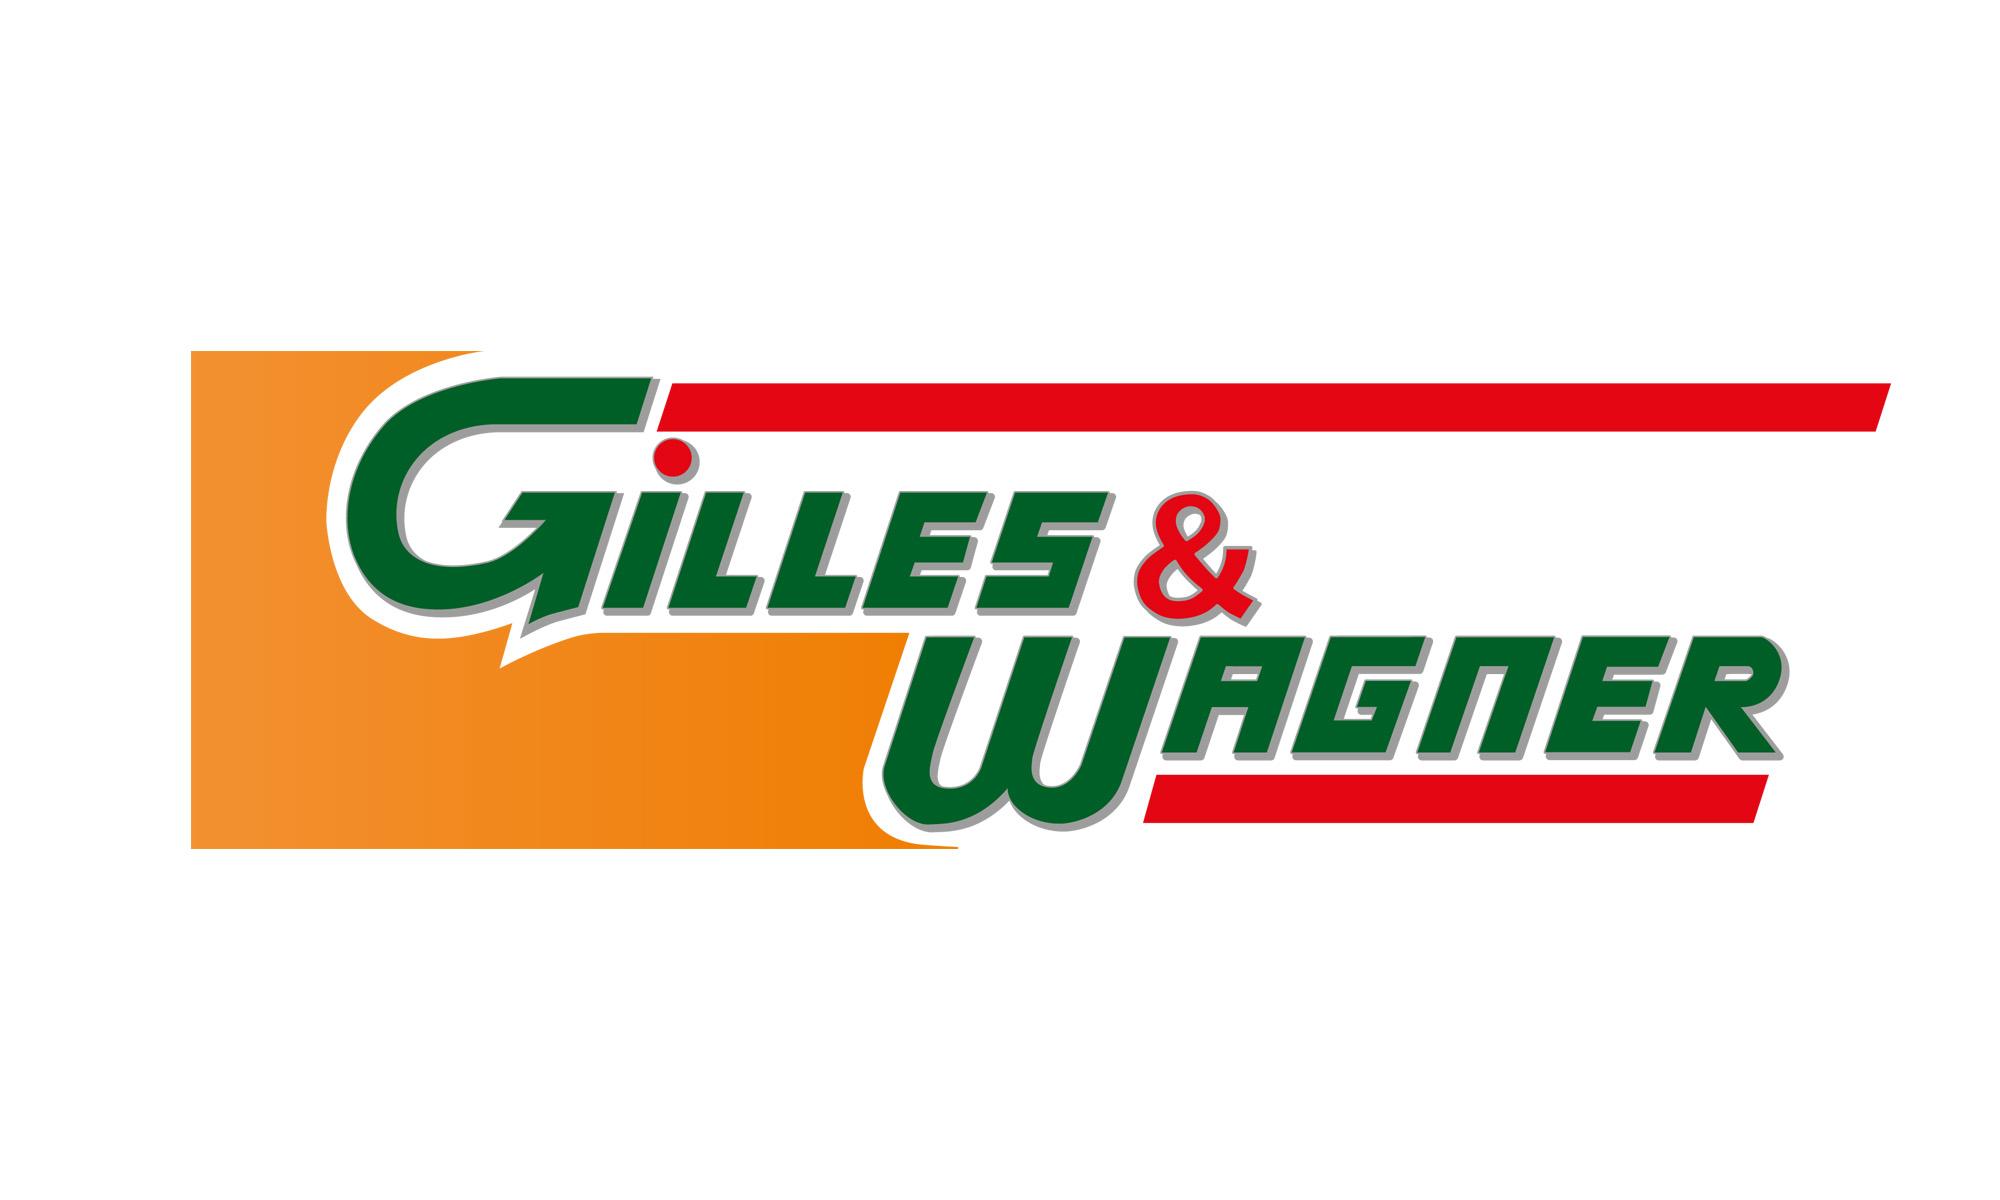 Gilles & Wagner Spedition GmbH und Co.KG Taucha